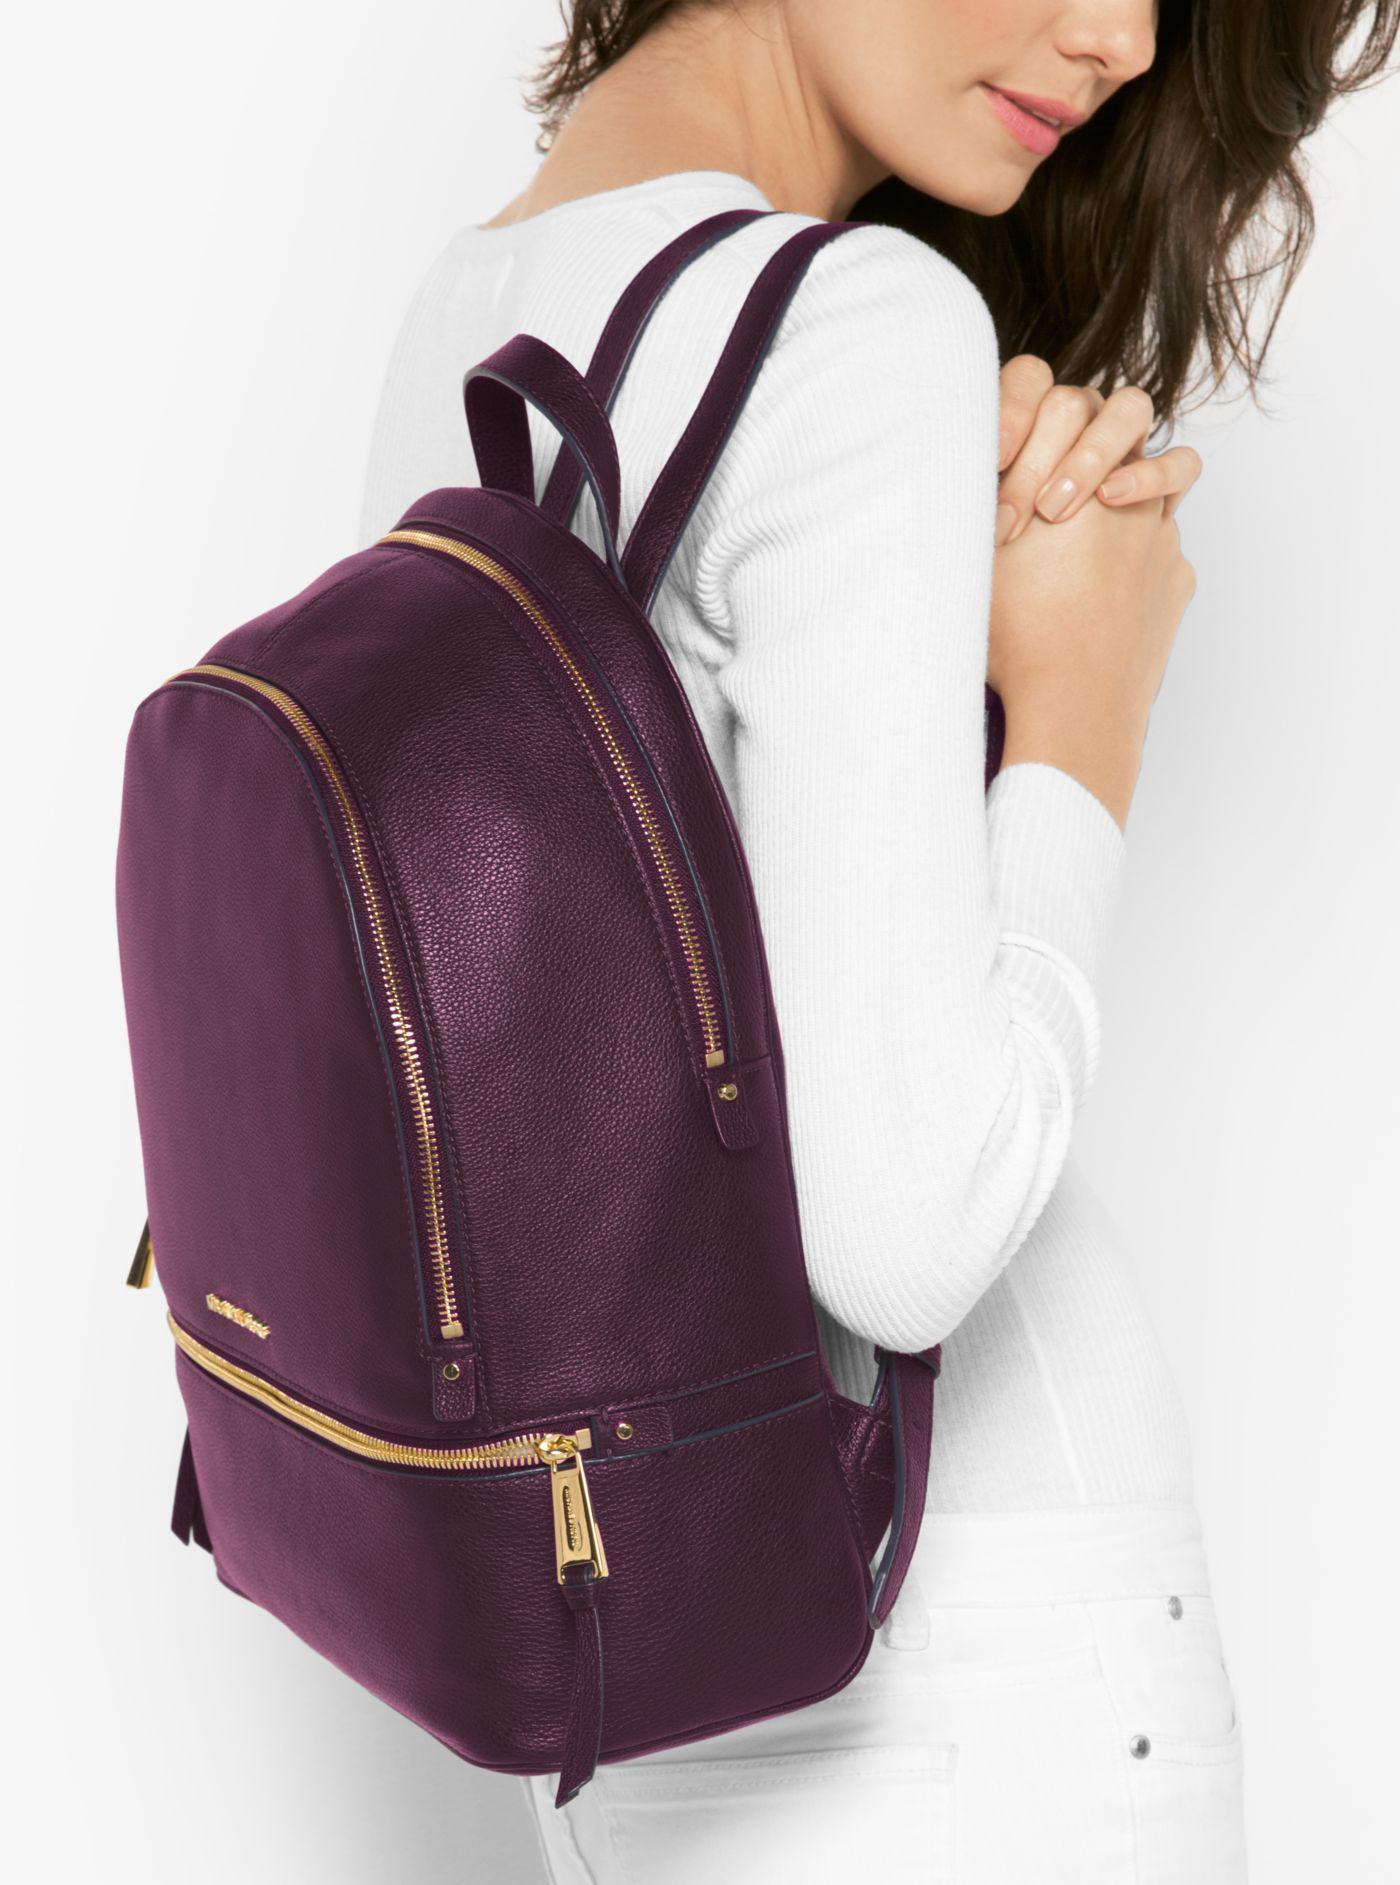 54cdba1caa05 ... release date lyst michael kors rhea large leather backpack in purple  f91aa 41318